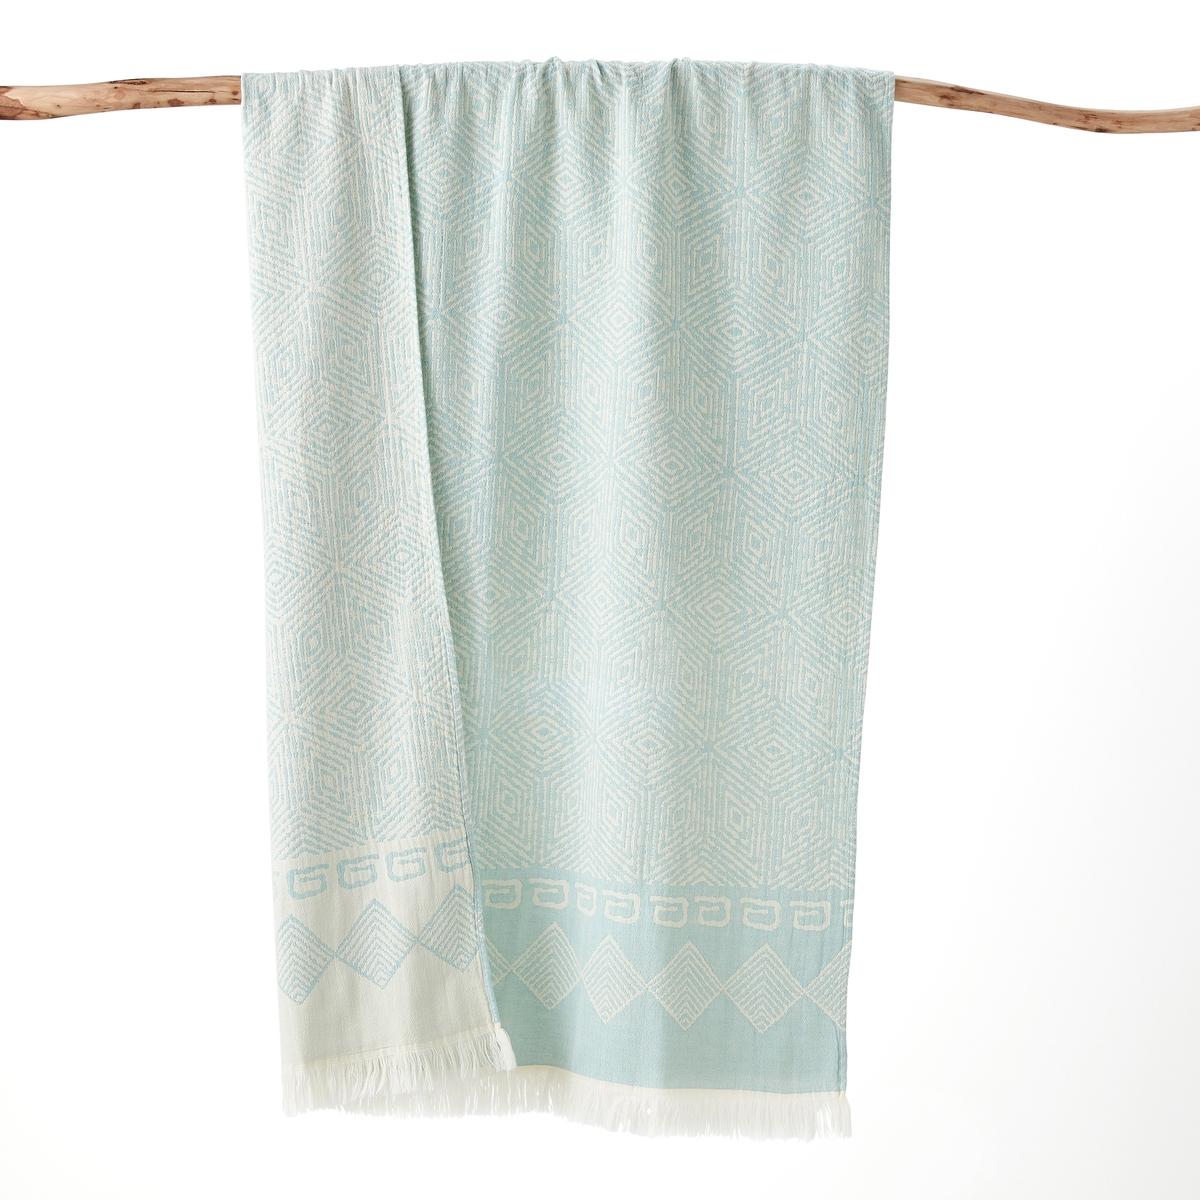 Полотенце La Redoute Пляжное FOSCATI 90 x 170 cm зеленый